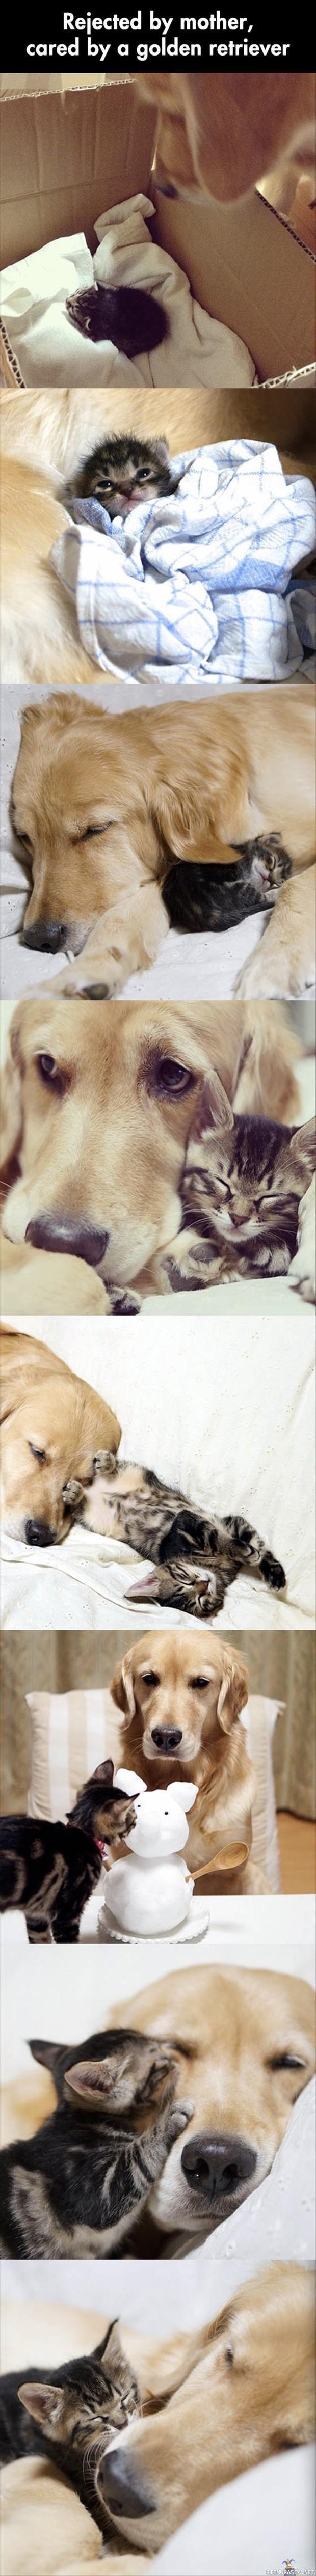 Kissanpennun uusi emo